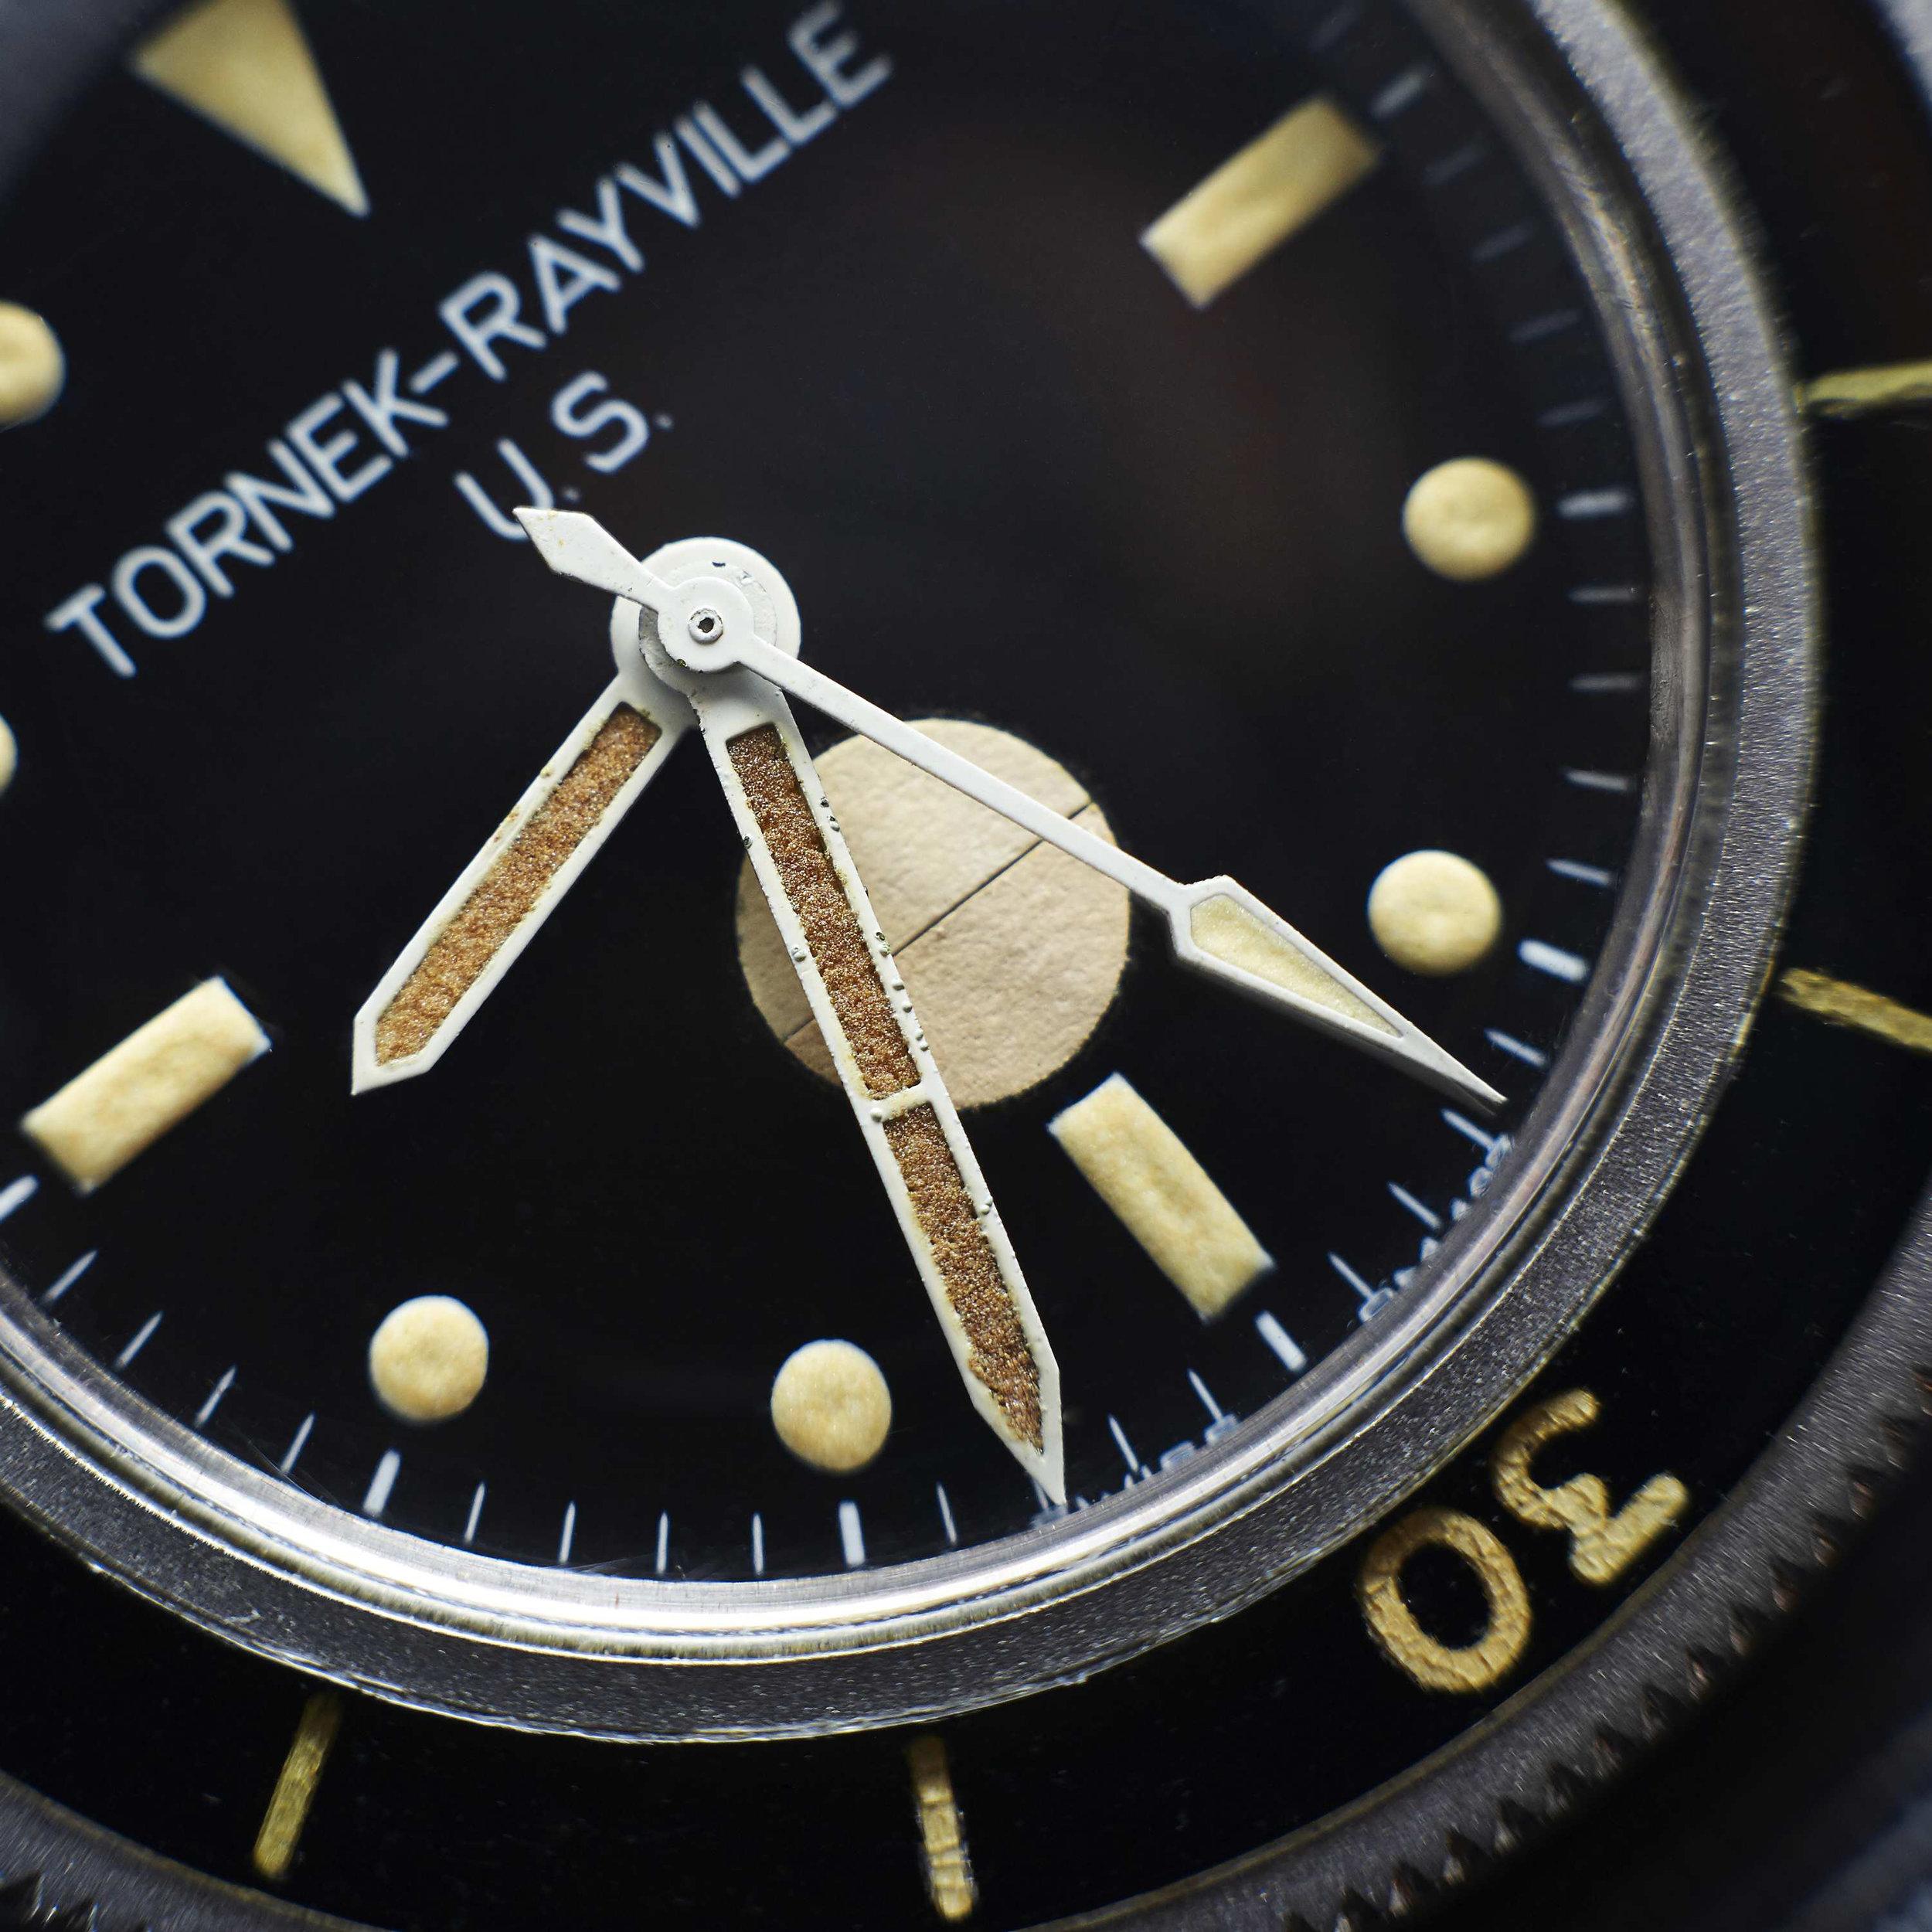 Tornek-Rayville_macro site.jpg